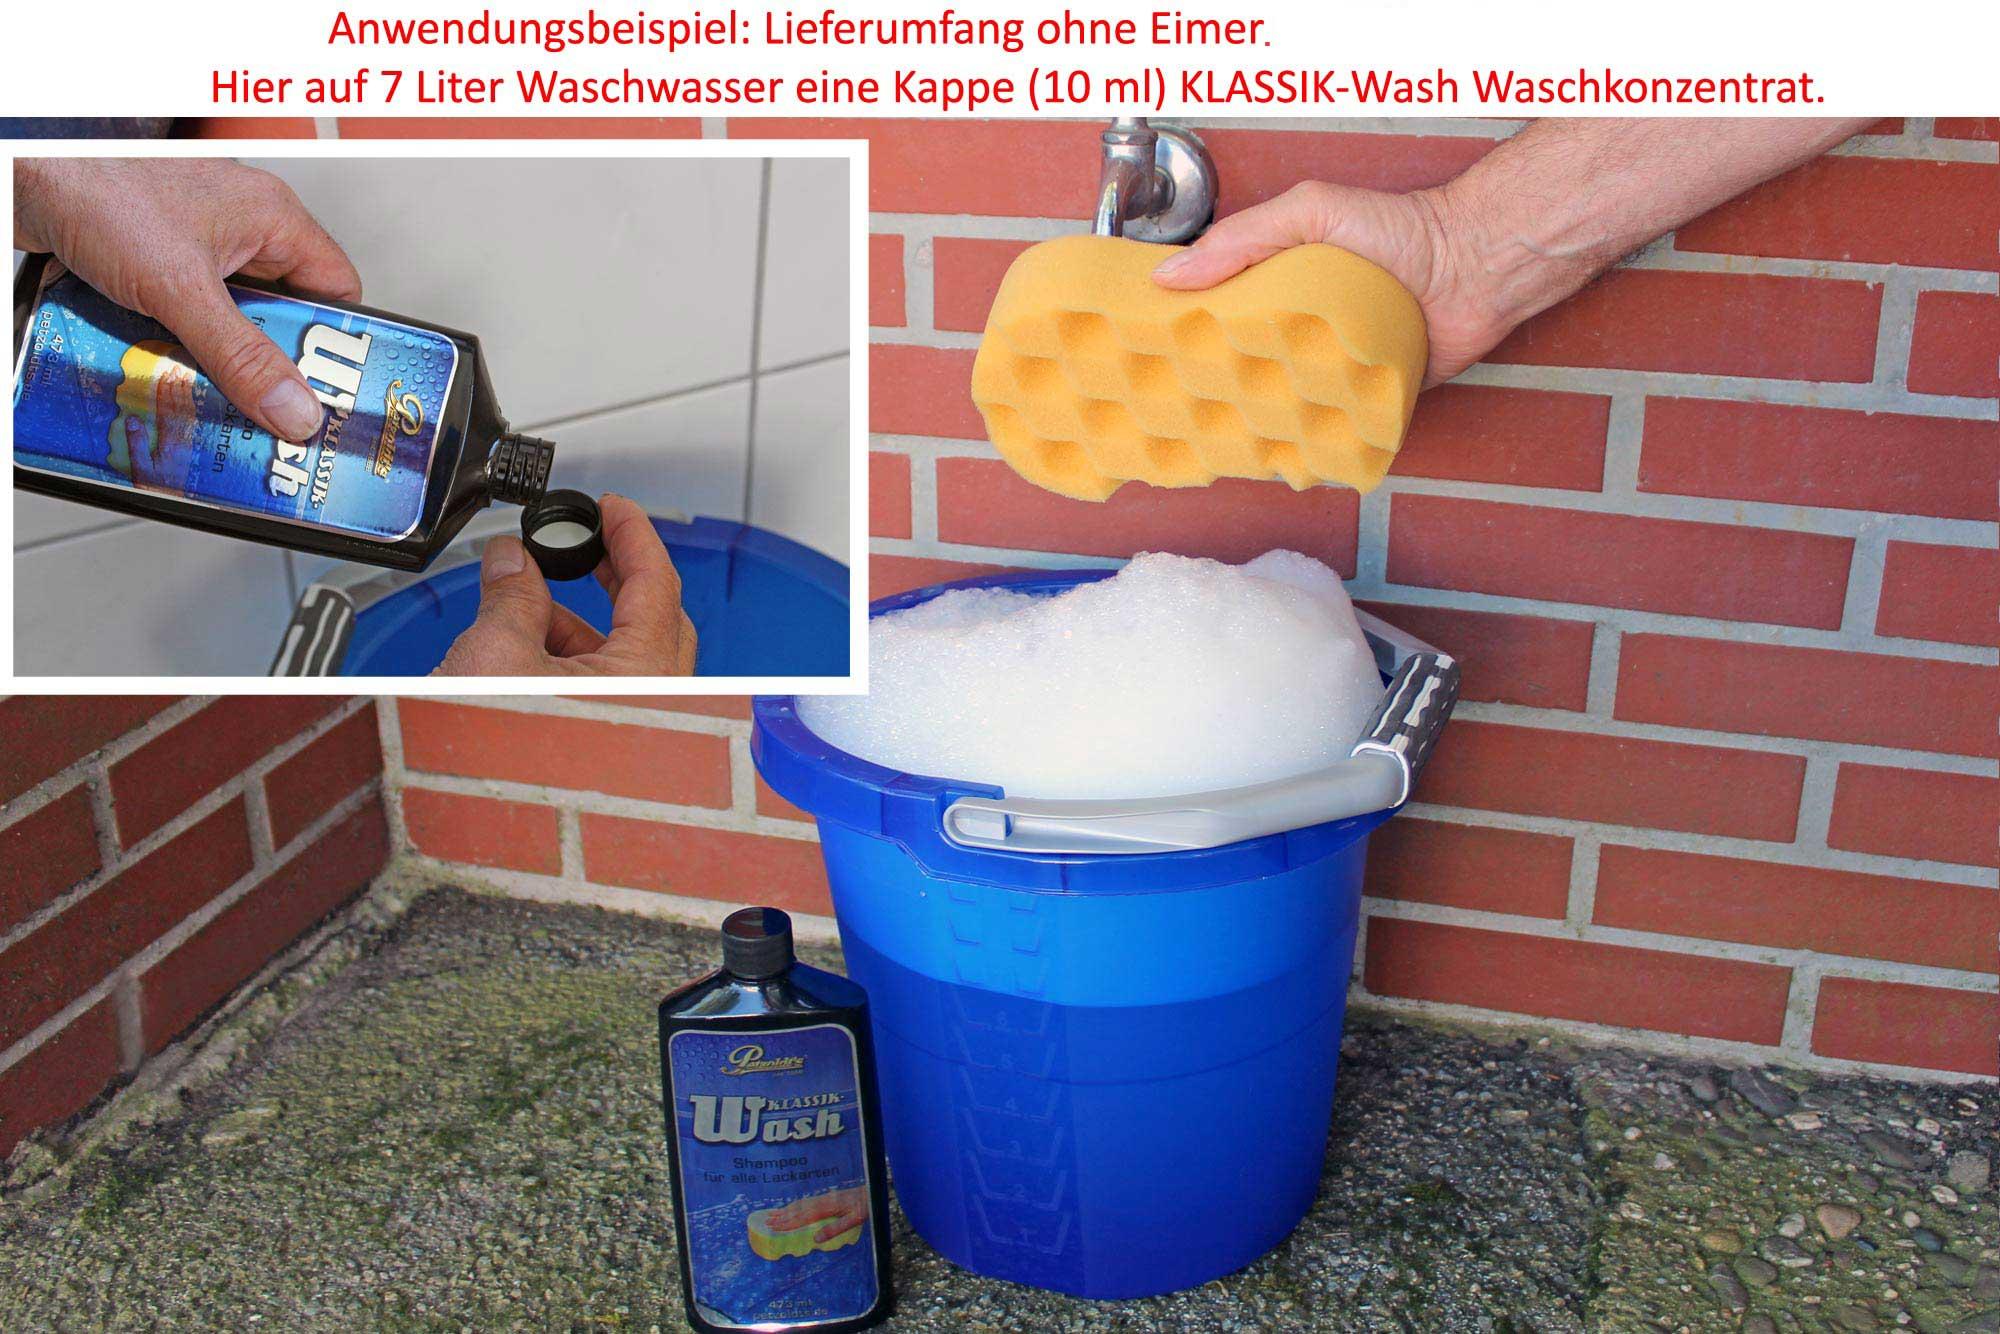 Petzoldts KLASSIK-Wash, Waschkonzentrat für KLASSIK-Glass